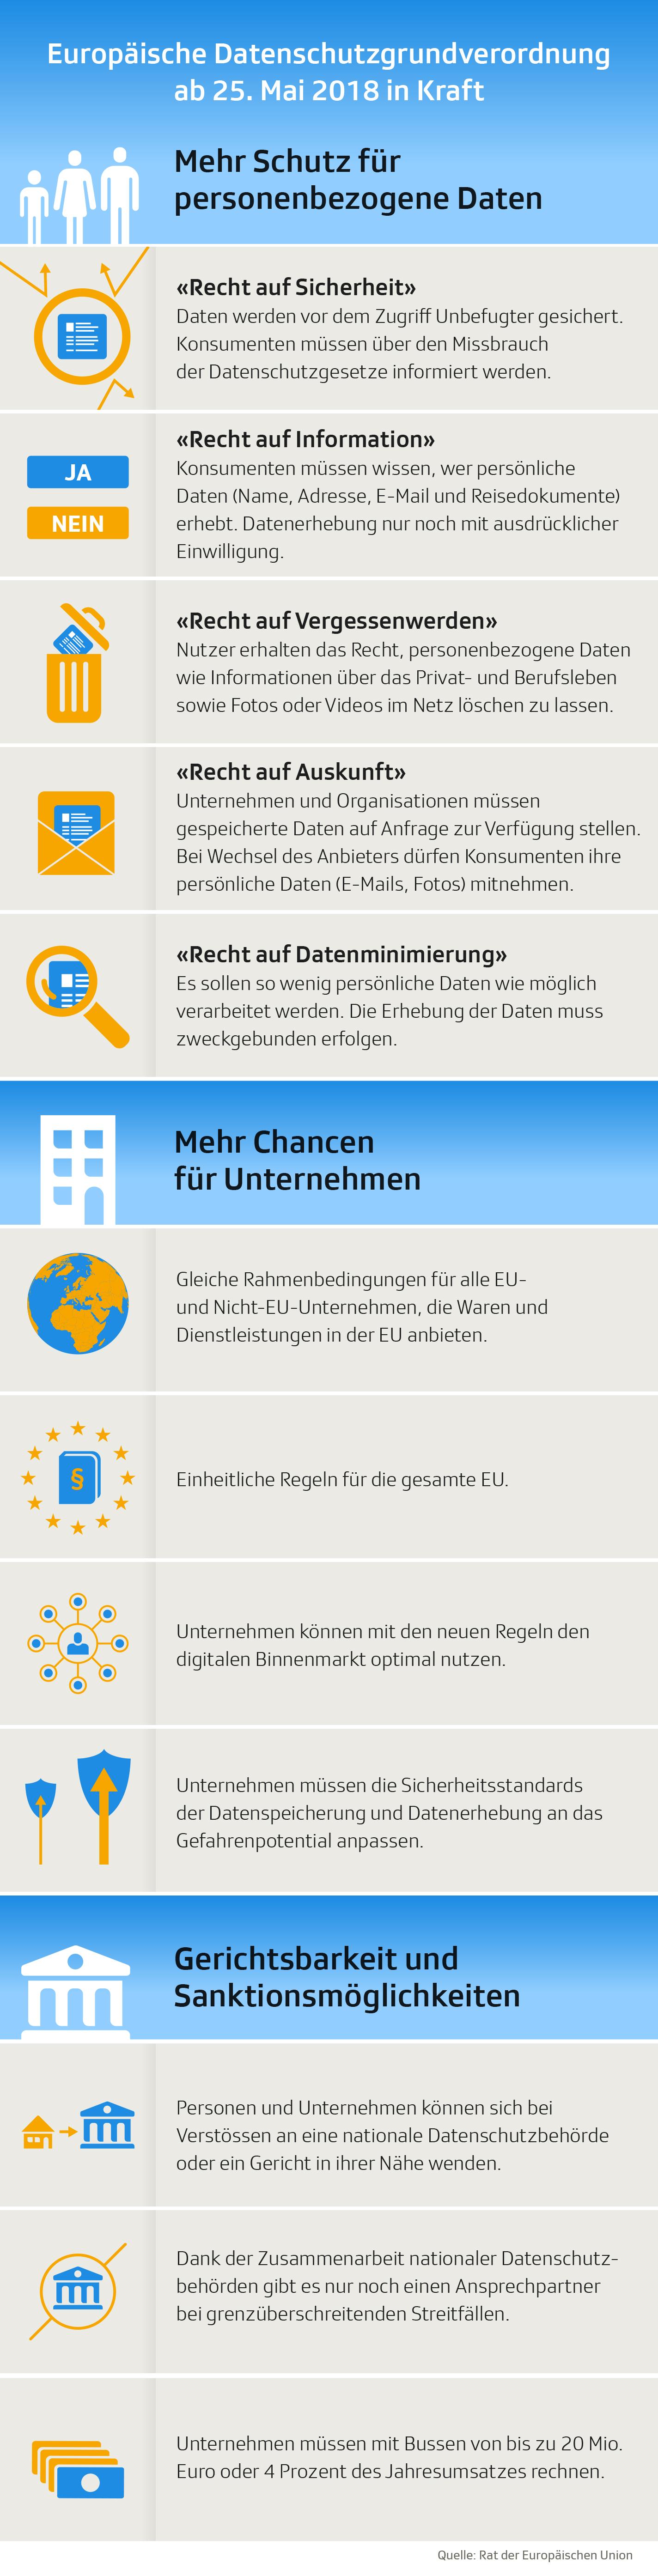 Infografik: Datenschutzbestimmungen